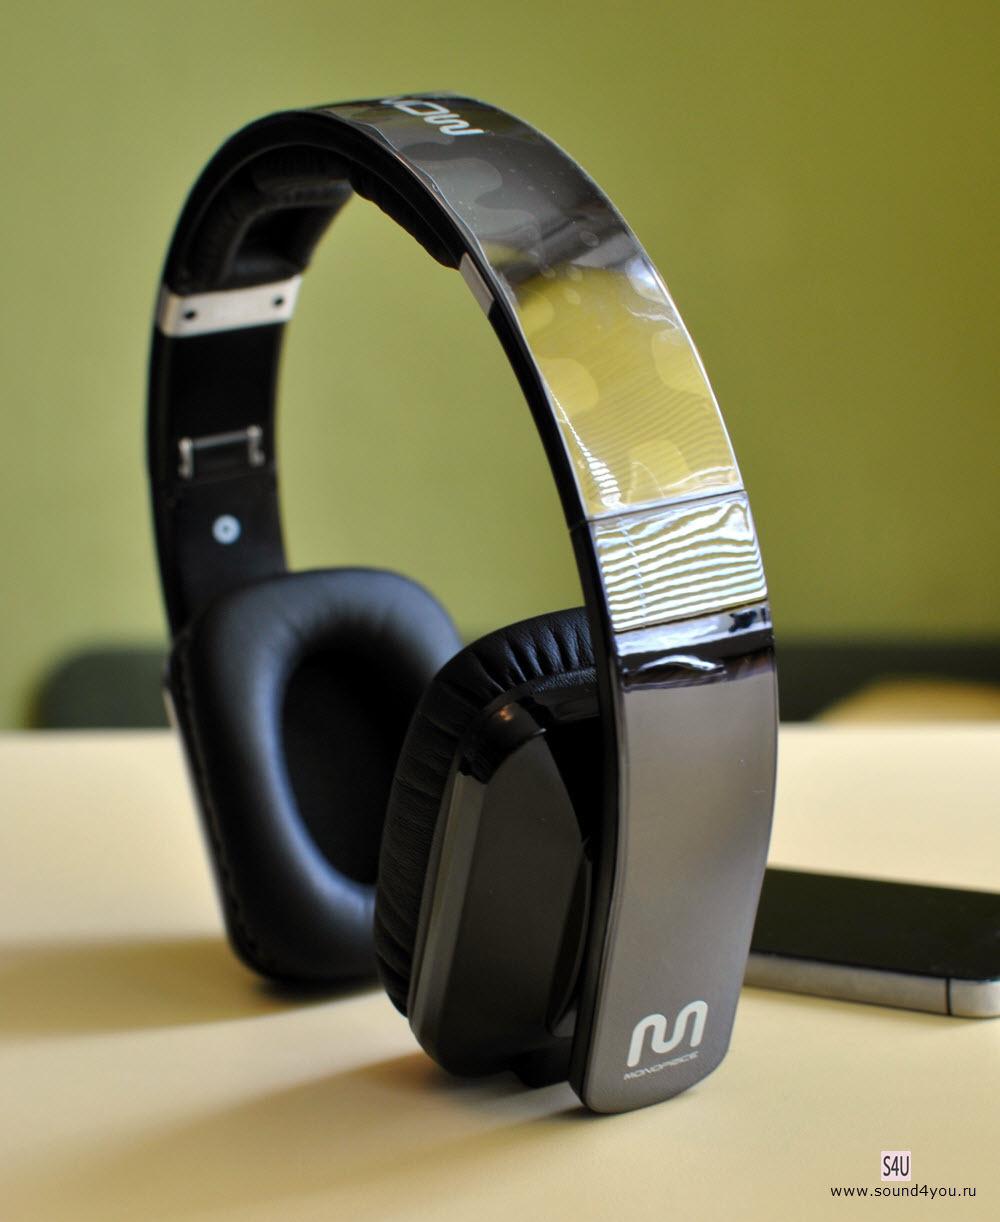 Обзор Bluetooth-наушников закрытого типа Monoprice Premium Virtual Surround Sound 10585 - 4